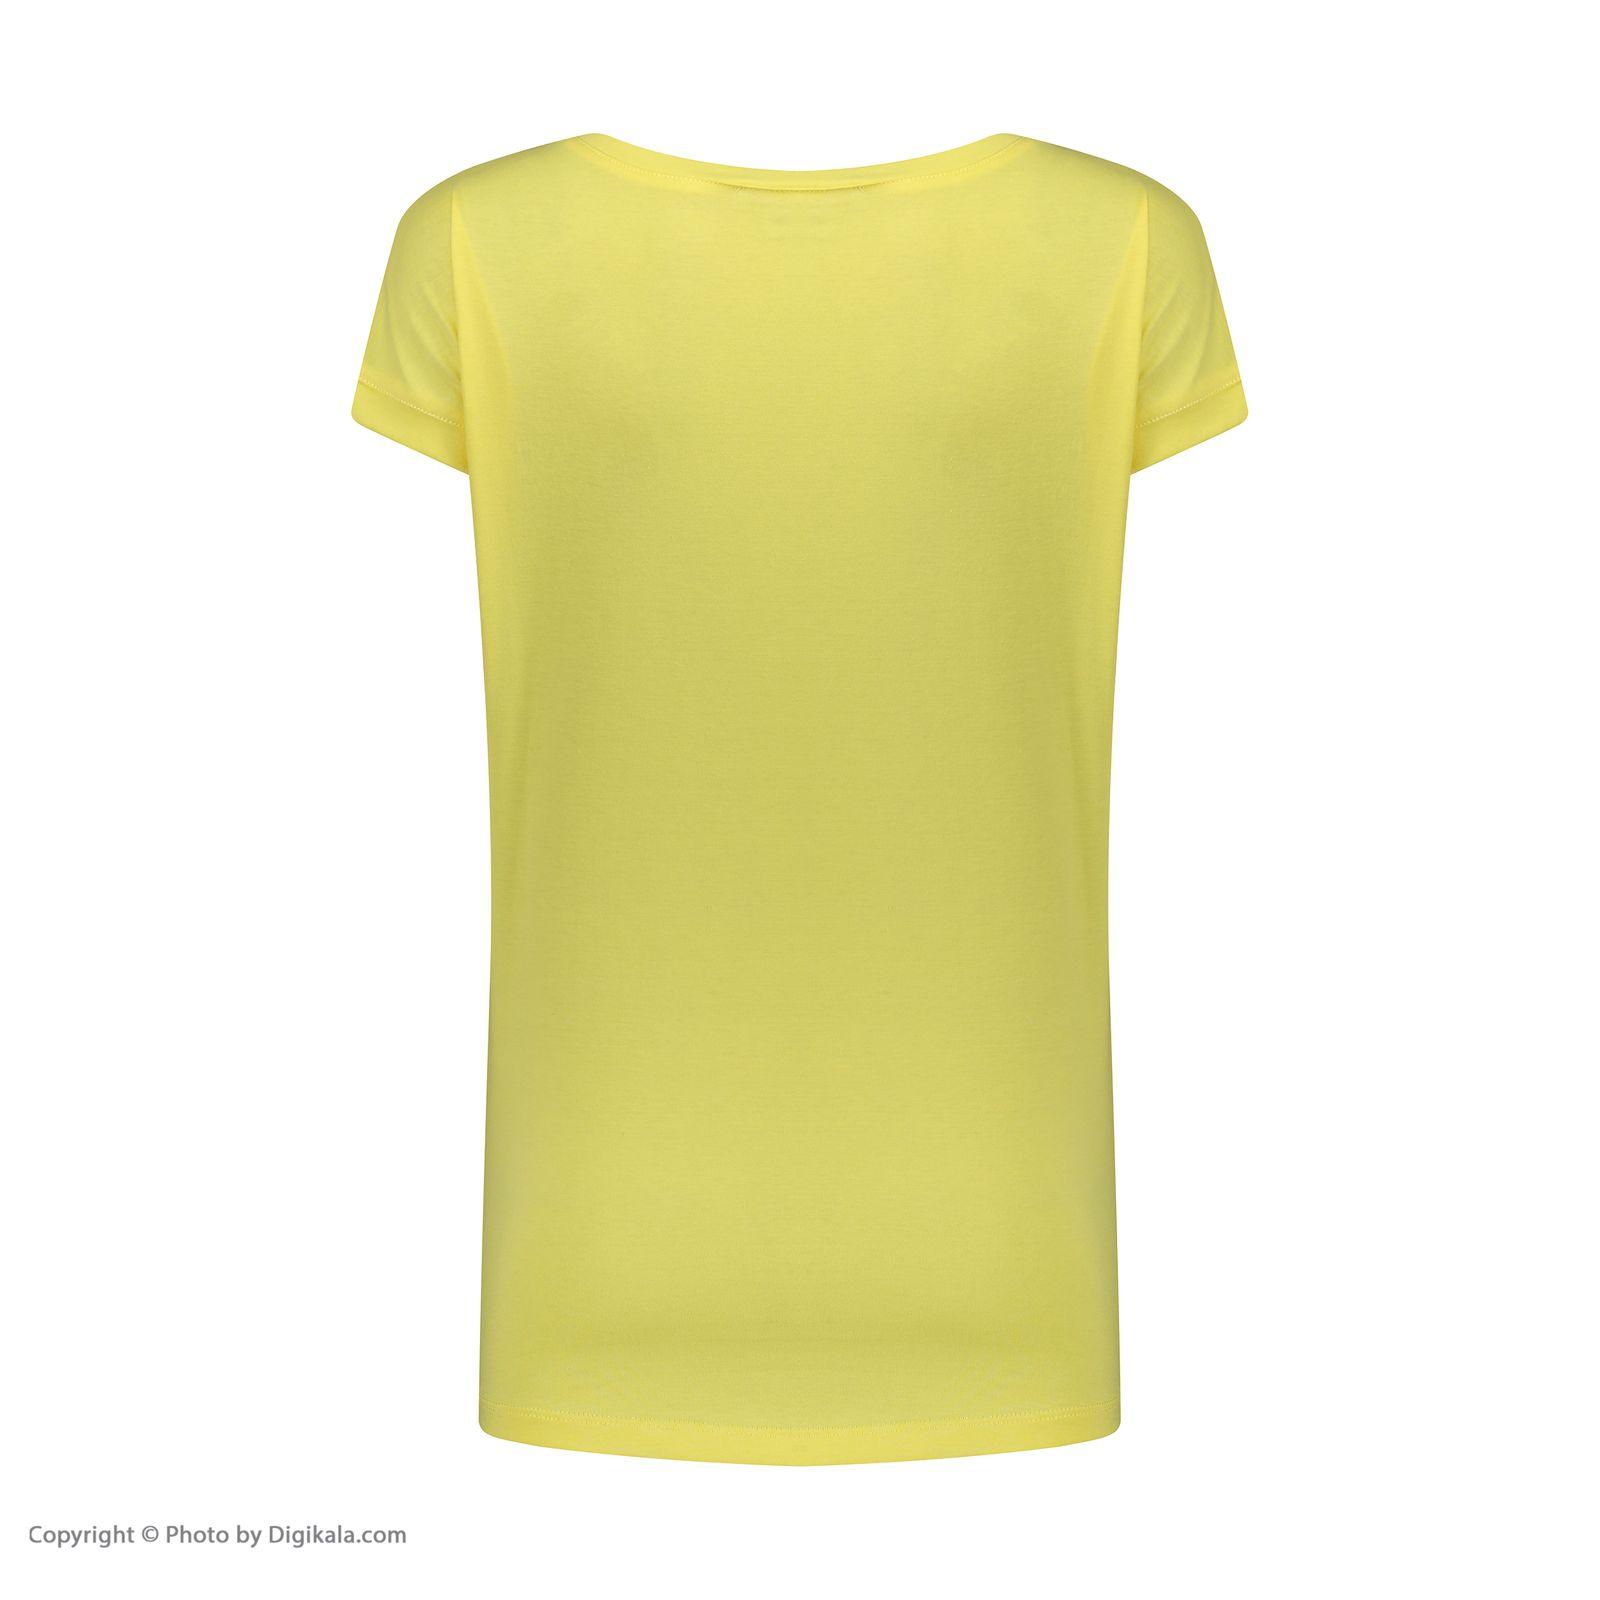 تی شرت زنانه اسپیور مدل 2W15-11 -  - 7